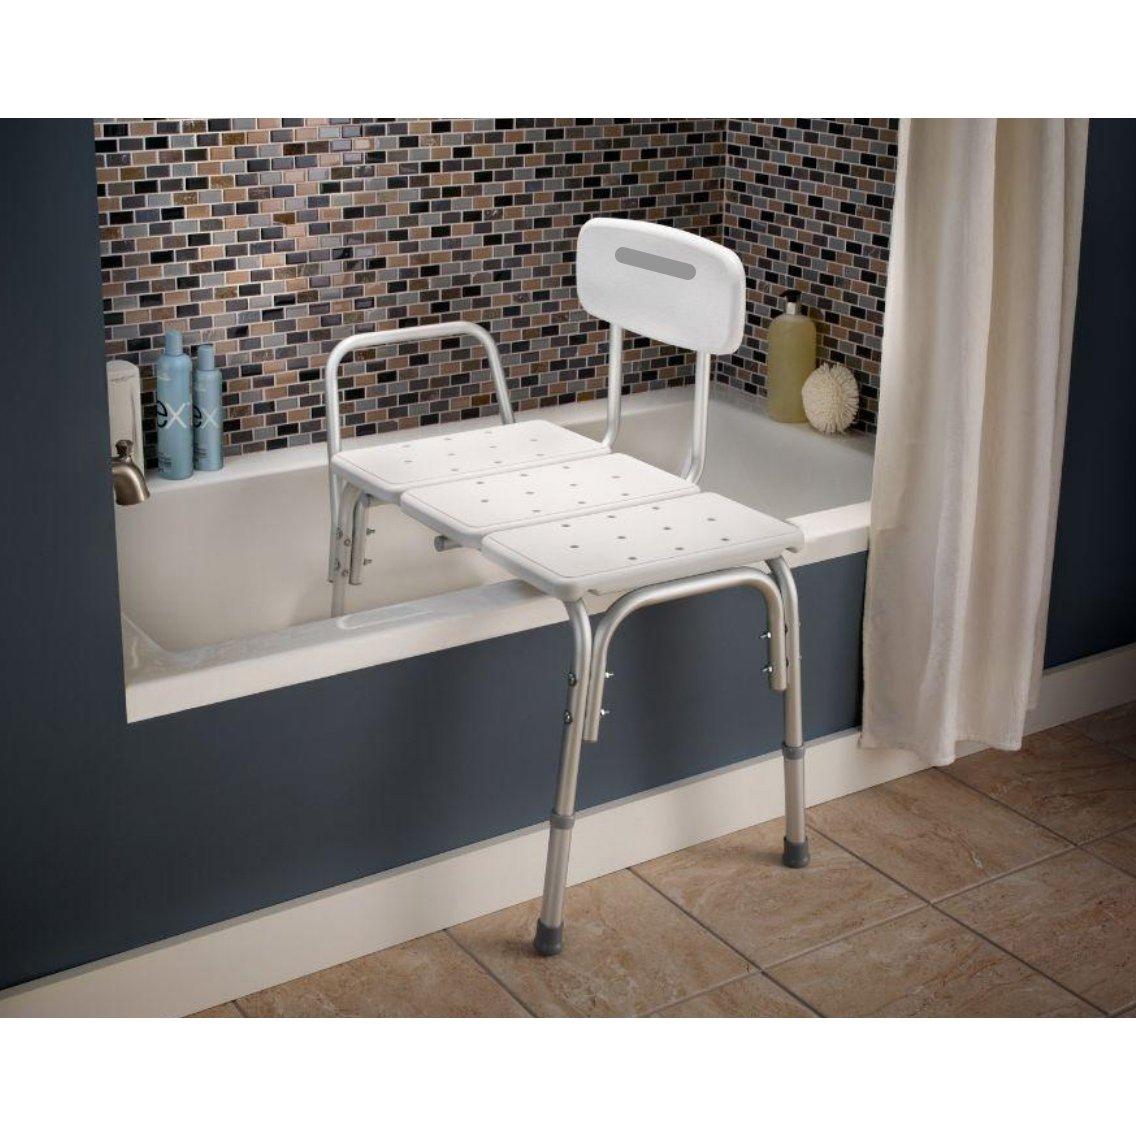 bathtub transfer bench by carex shower transfer benches